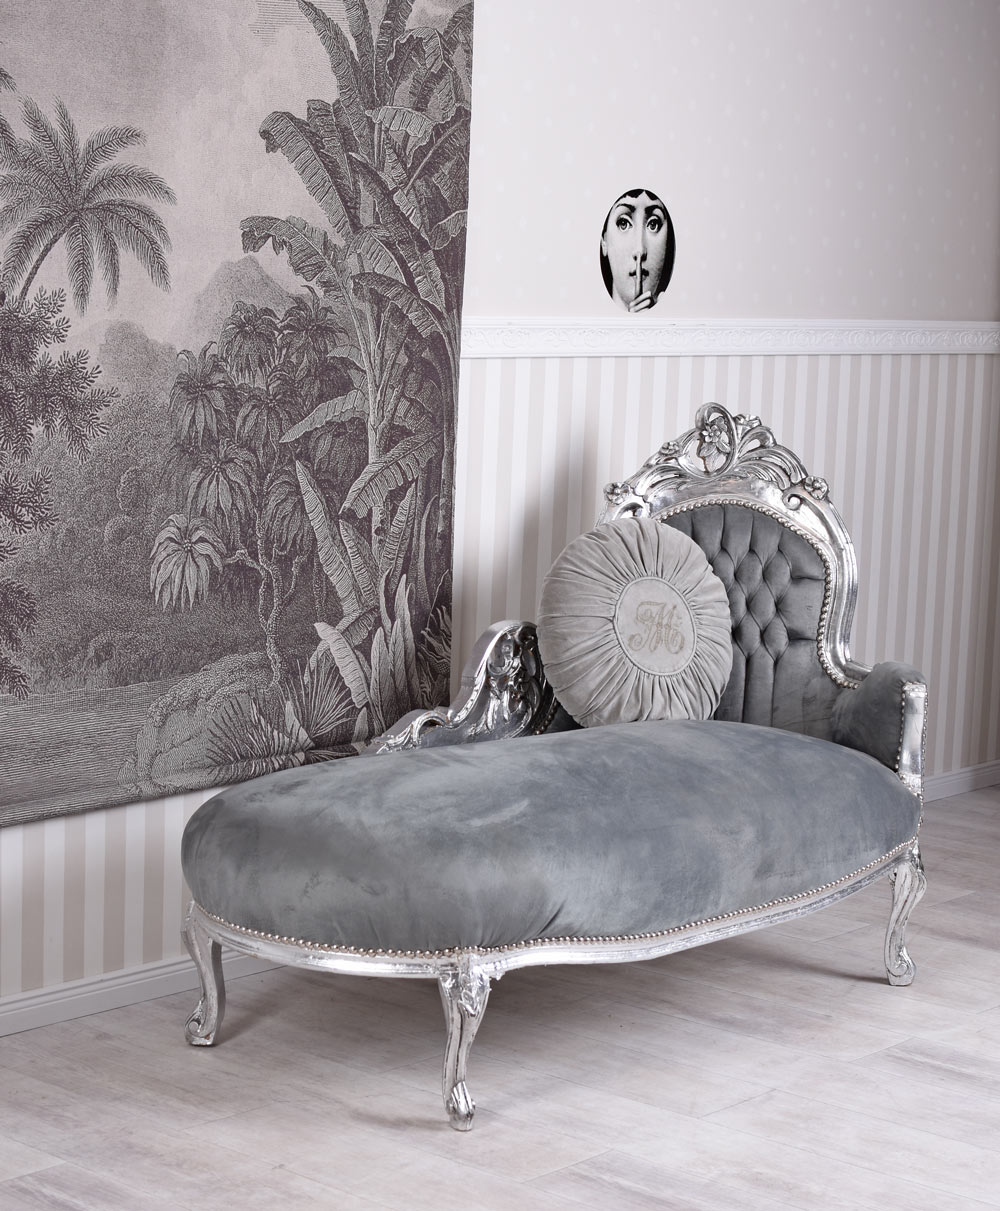 Full Size of Recamiere Barock Rot Boudoir Chaiselongue Diplomatie Sofa Samt Antik Couch Liege Daybed Rokoko Mit Bett Wohnzimmer Recamiere Barock